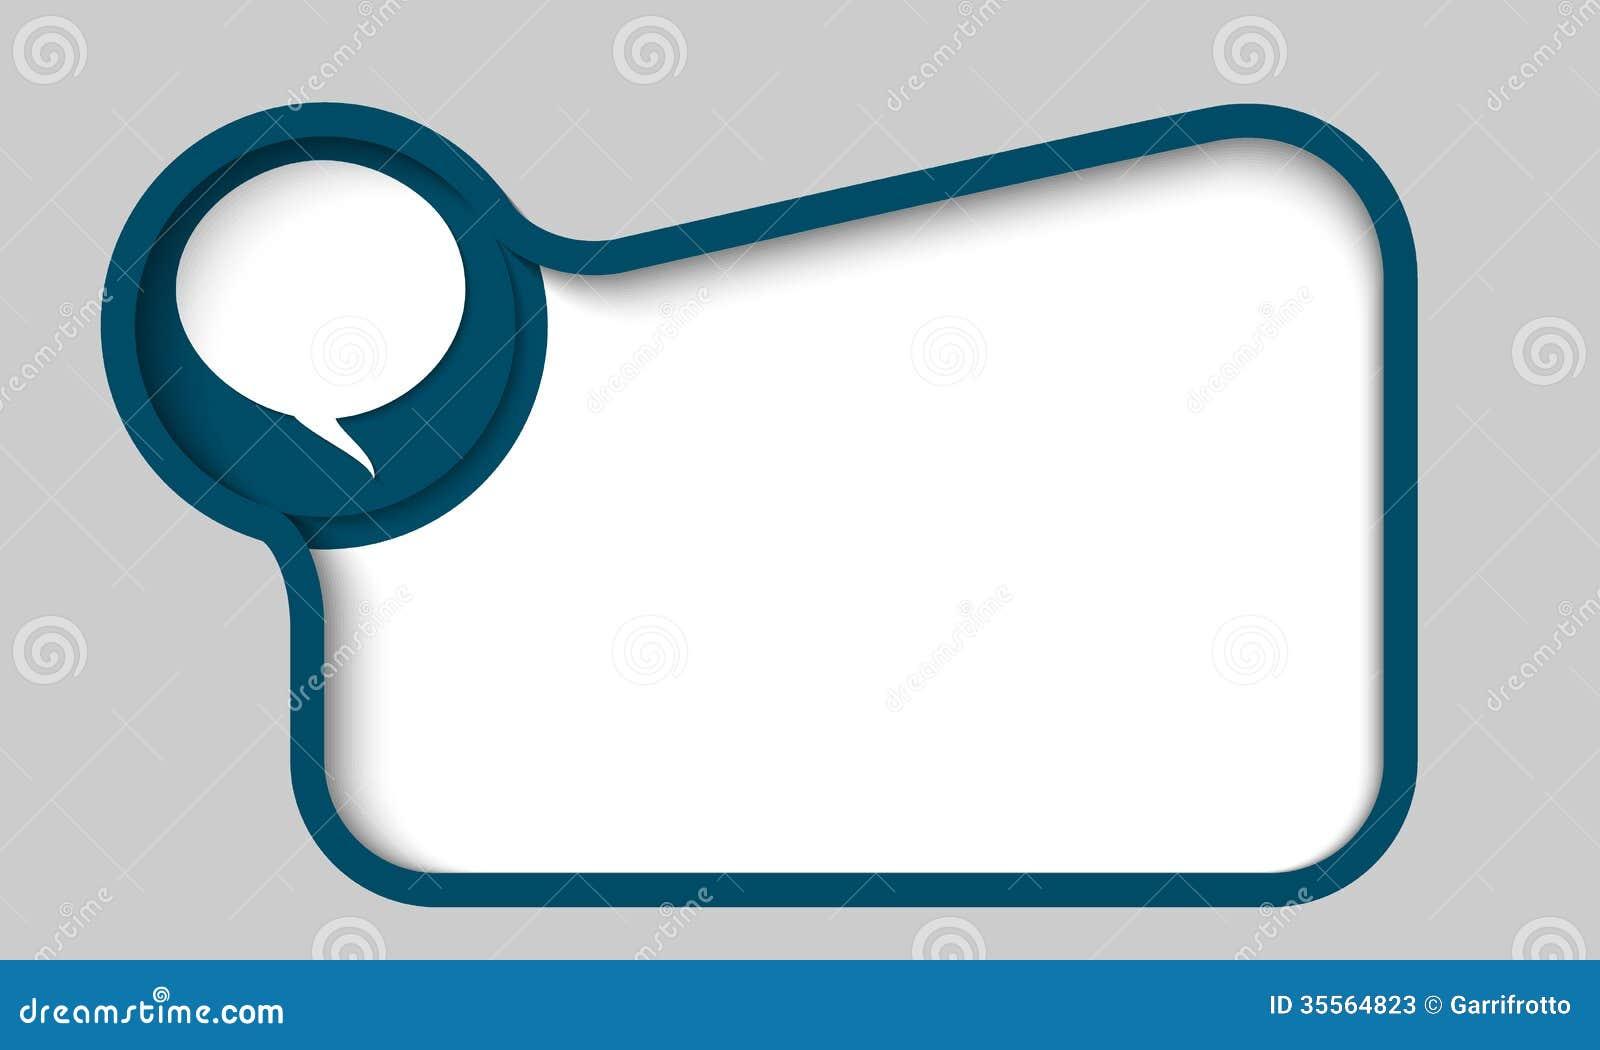 Stock Photos Blue Text Box Any Text Speech Bubble Dark Image35564823 on Dark Blue Border